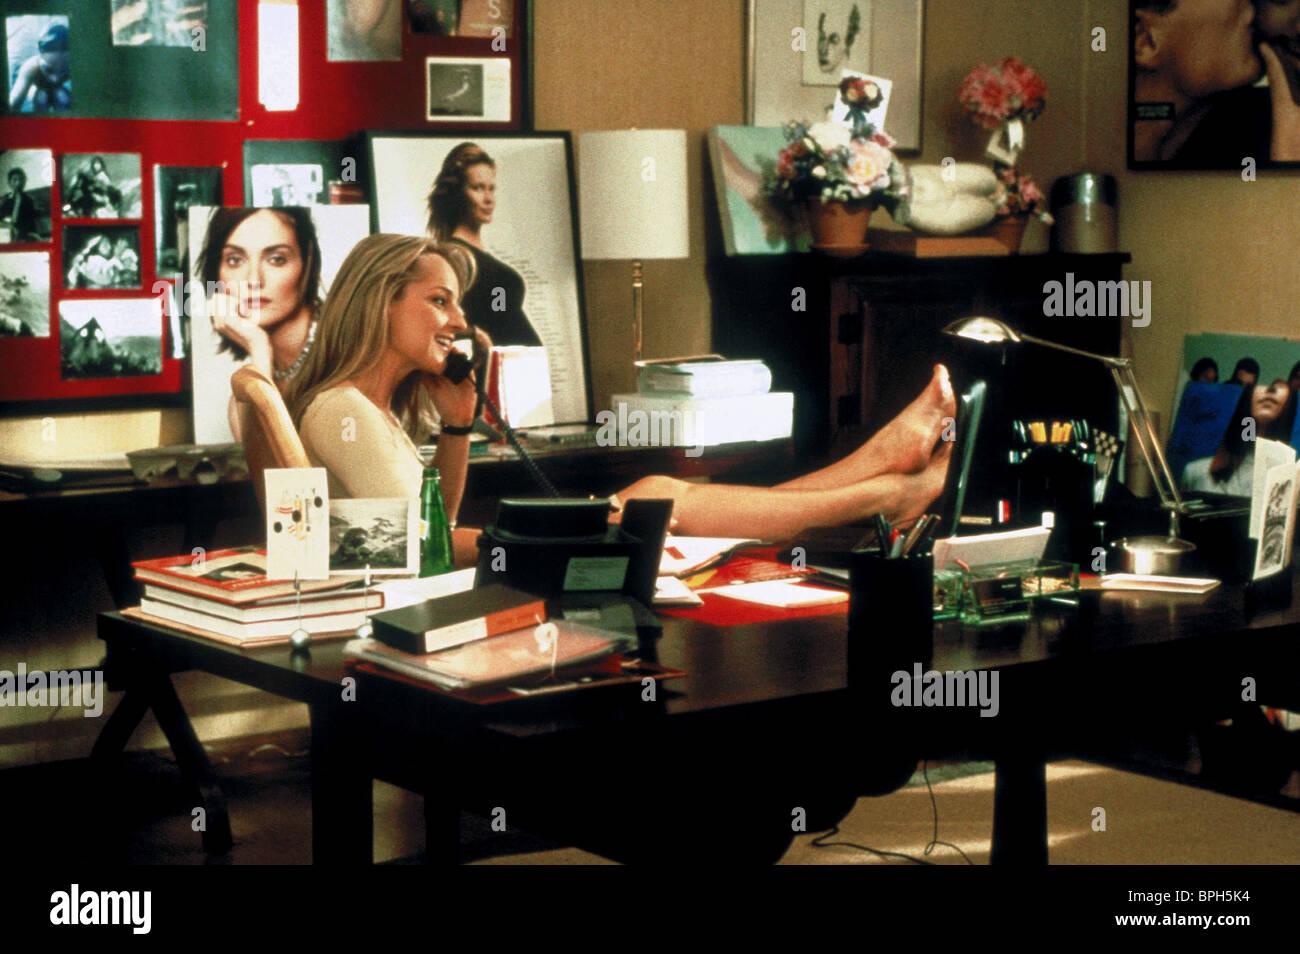 HELEN HUNT WHAT WOMEN WANT (2000 Stock Photo, Royalty Free ...Helen Hunt What Women Want